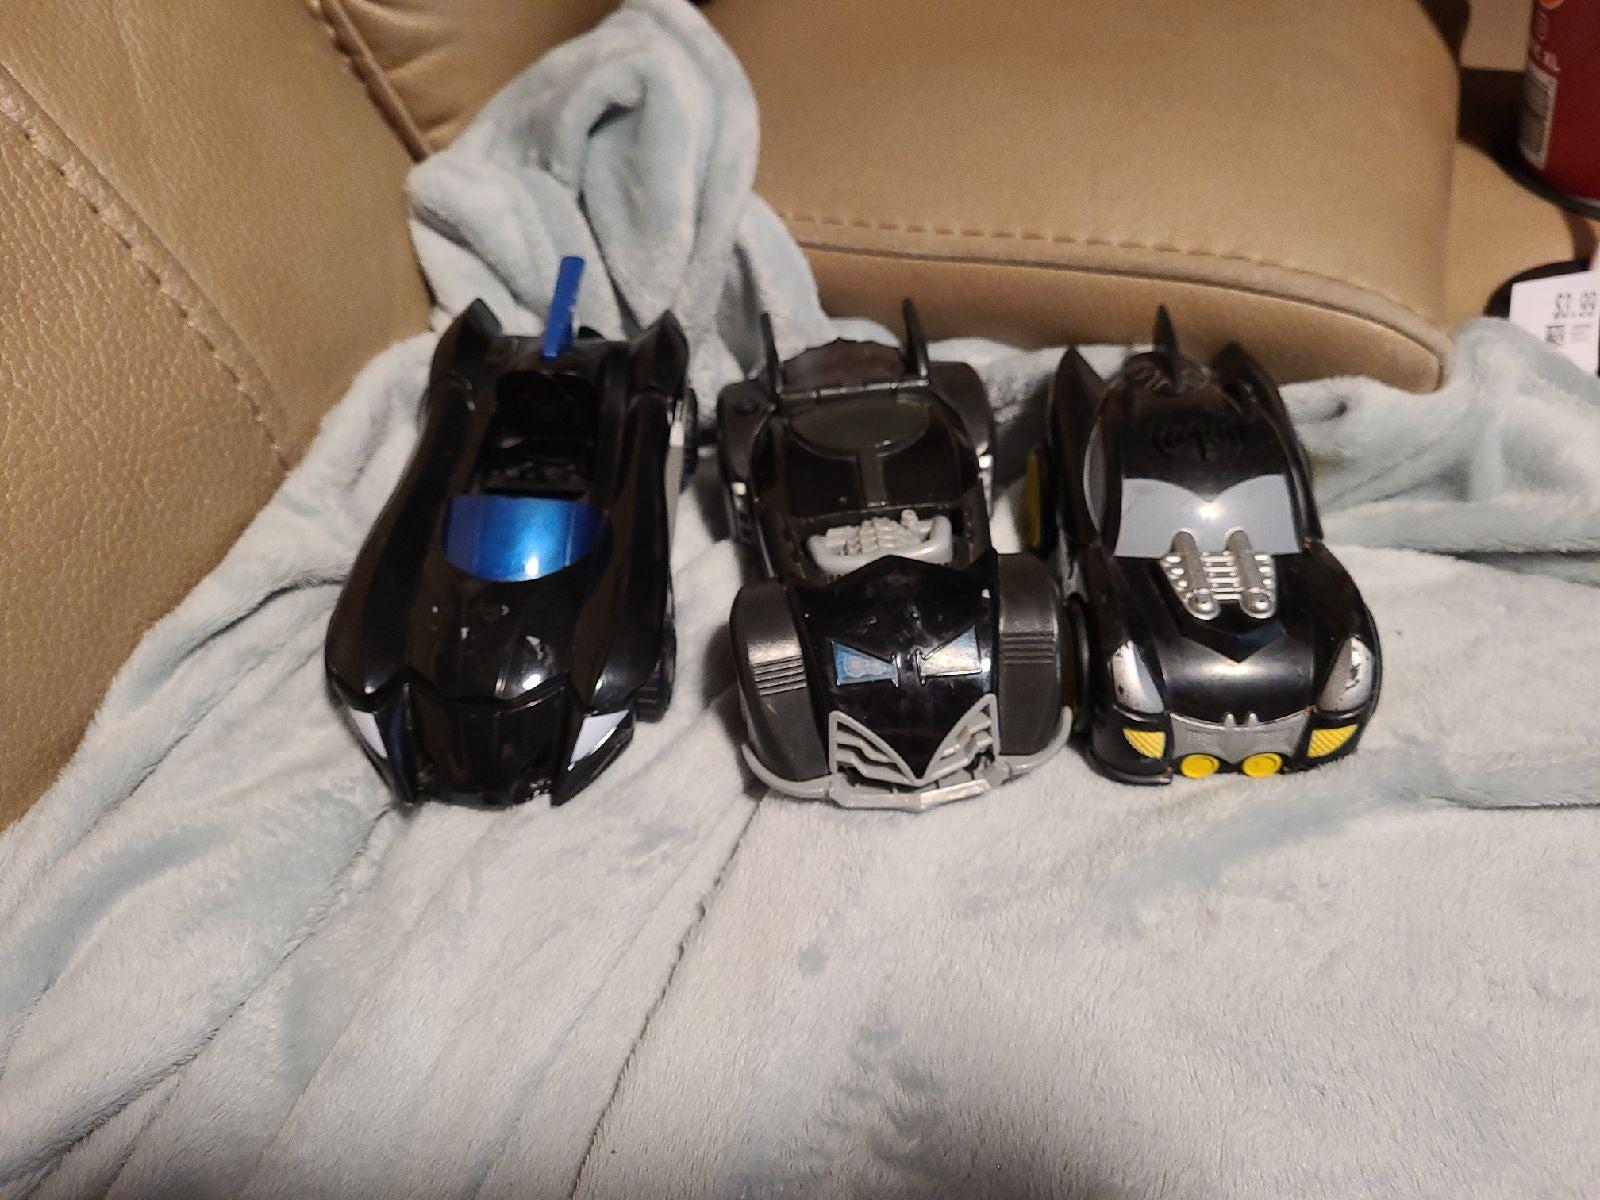 Batman Batmobile Cars Lot of 3